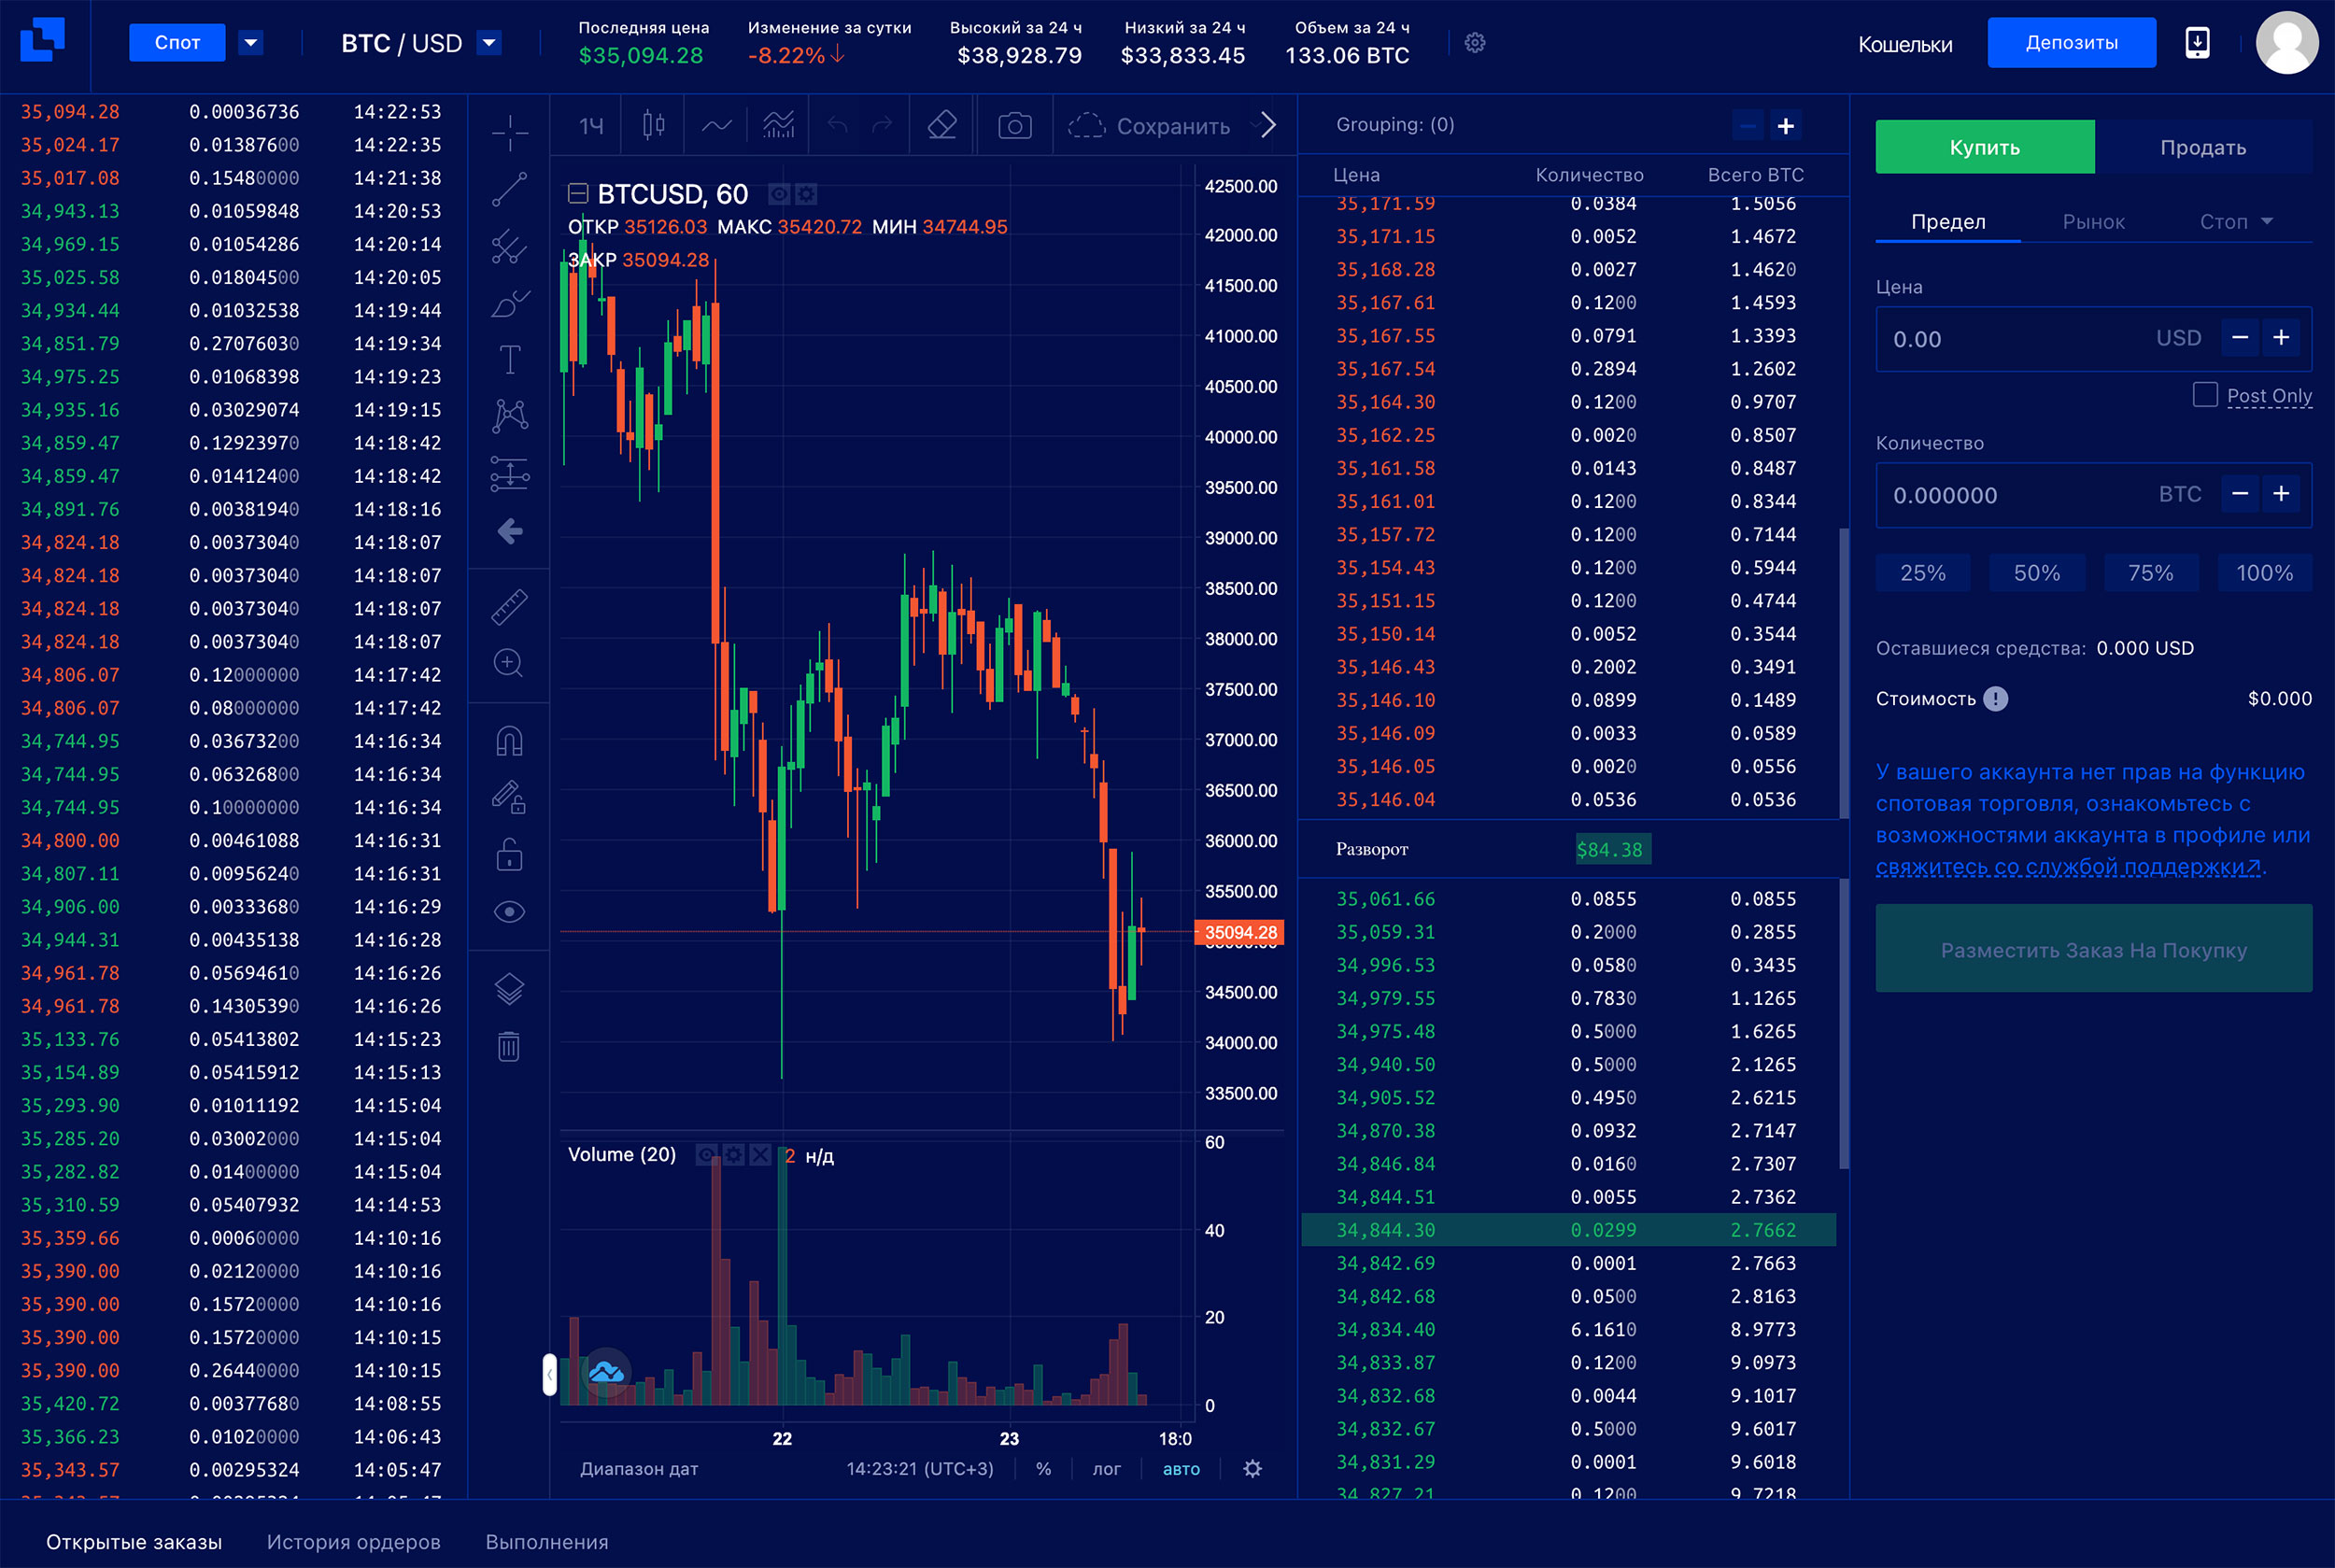 биржа криптовалют liquid платформа интерфейс